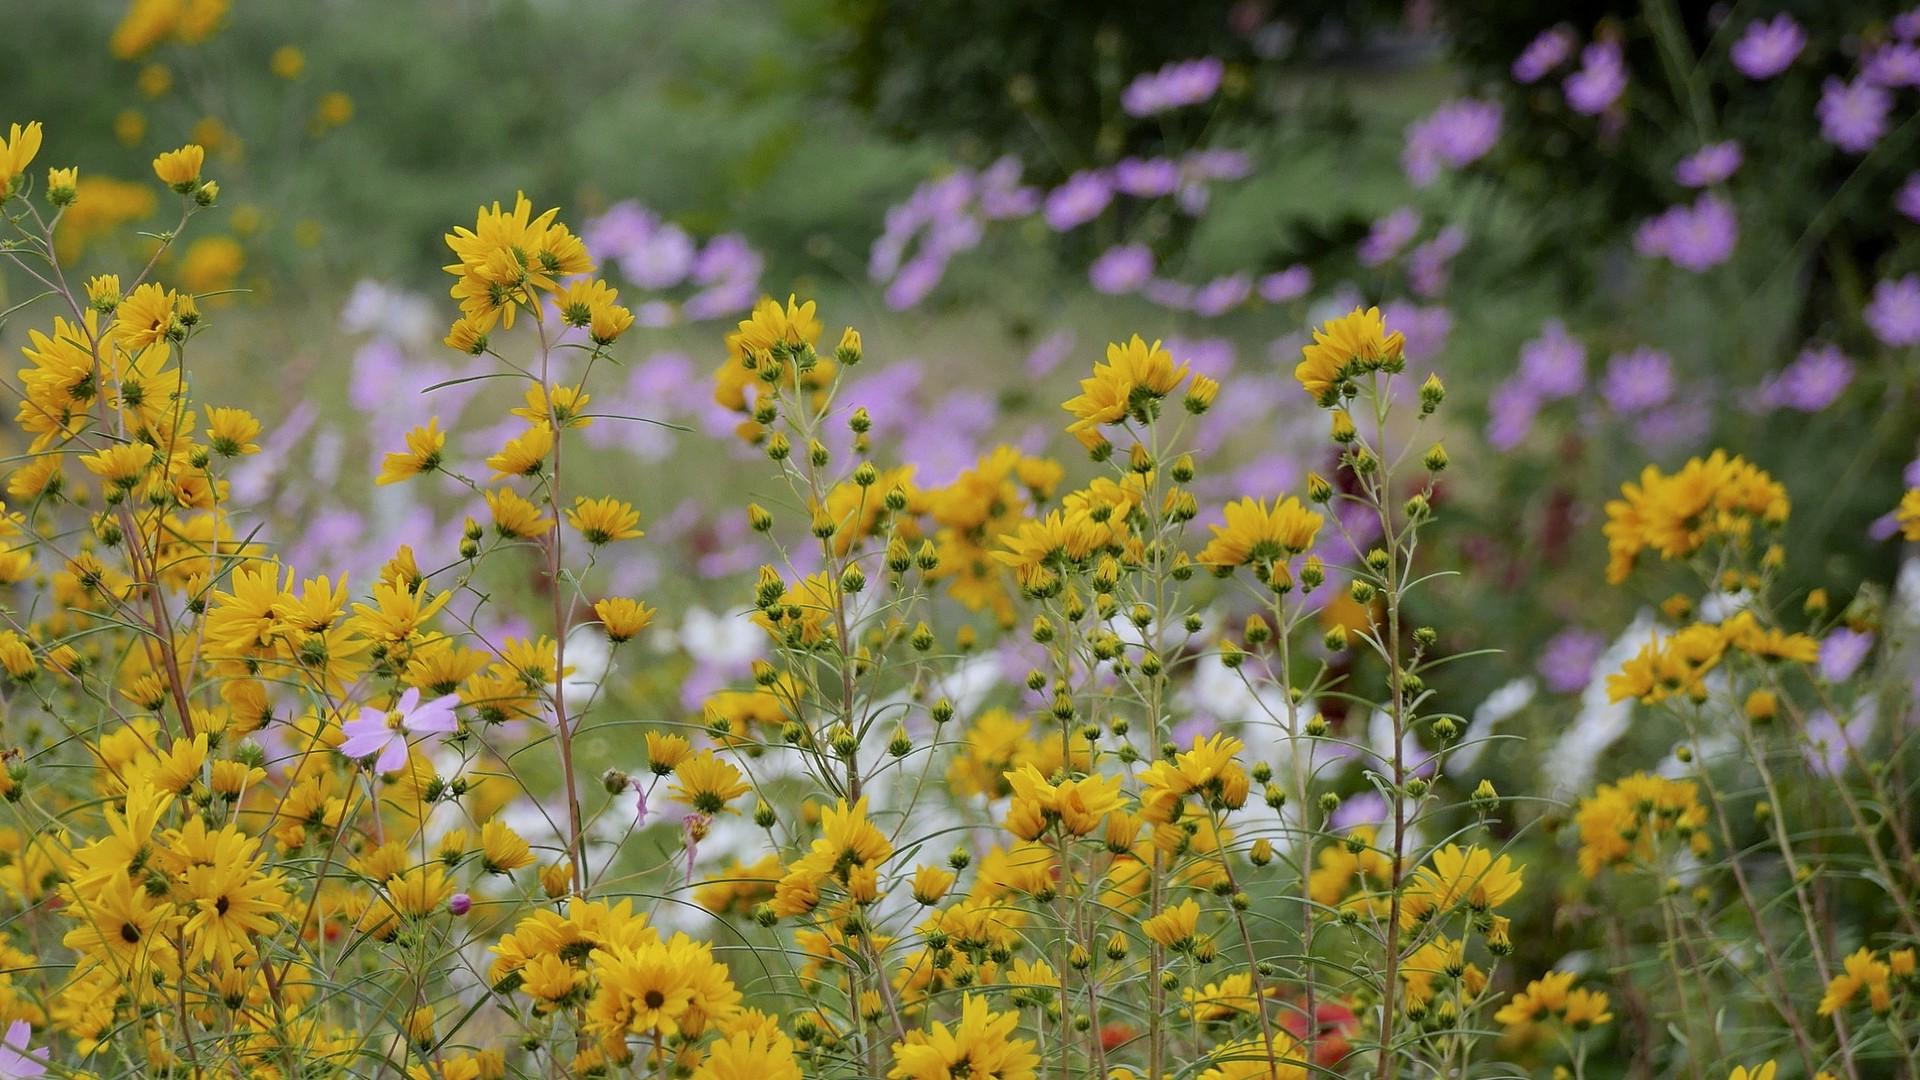 Wallpaper Nature Yellow Flowers Field Blossom Herb Autumn